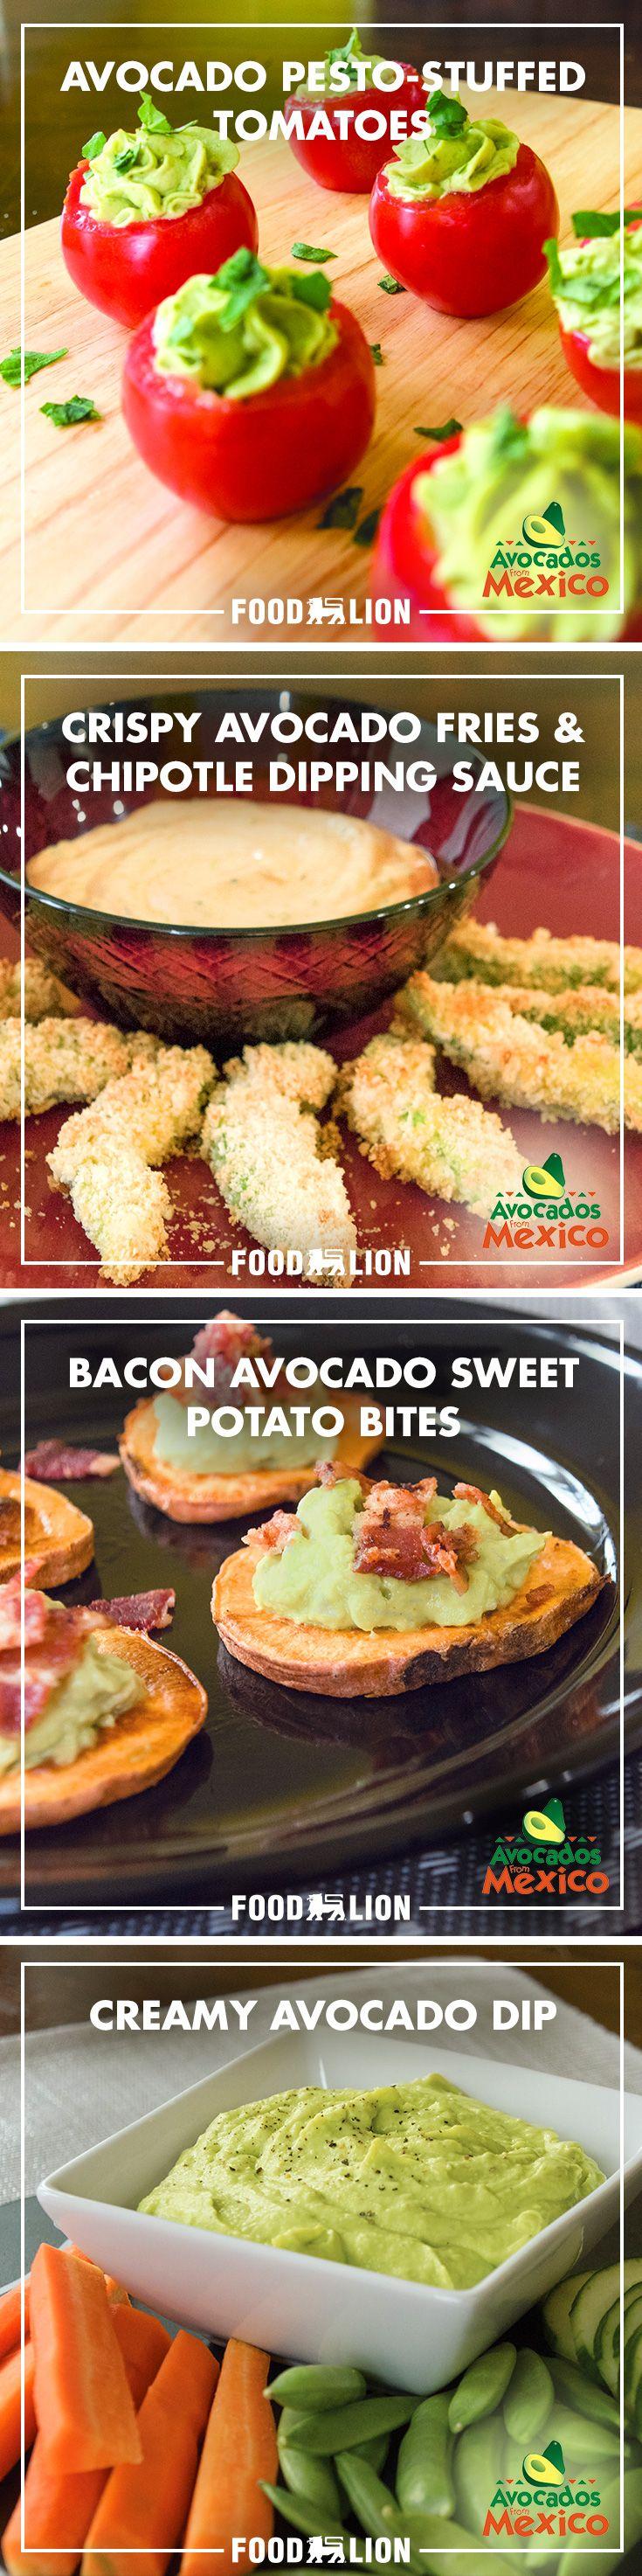 Avocado Recipes Avocado Recipes Party Food Appetizers Food